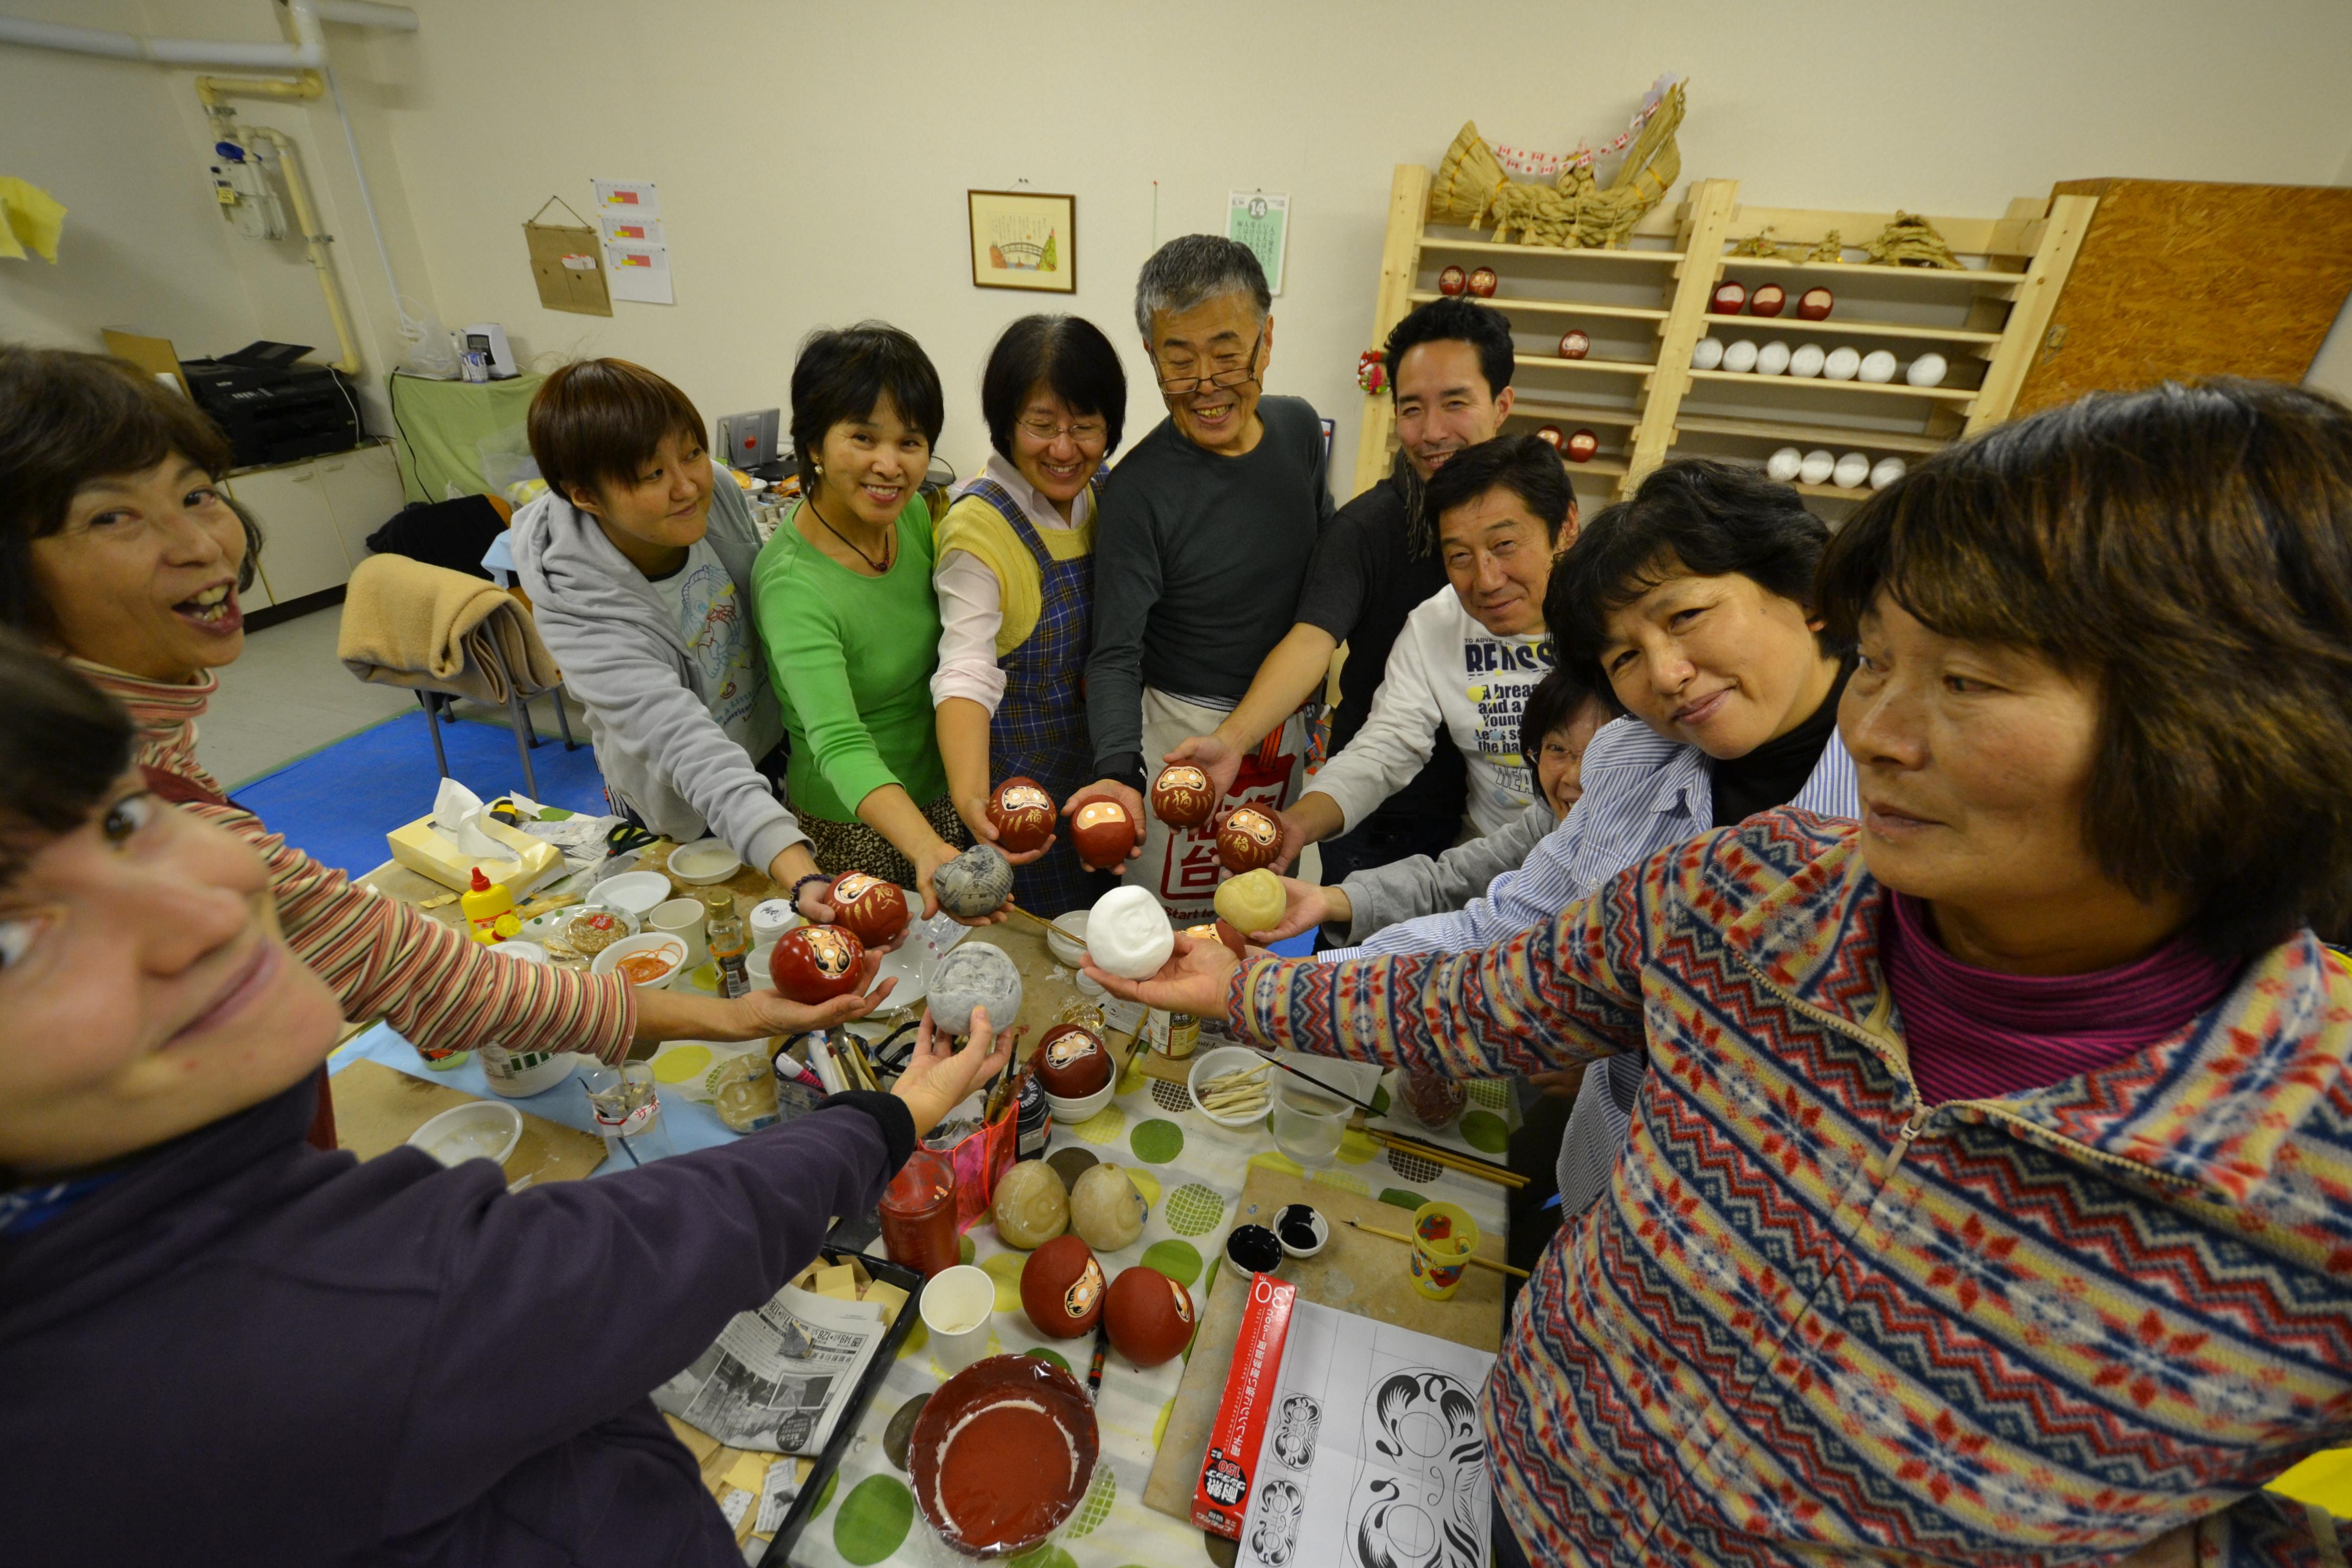 sendai daruma group and hands circle.JPG